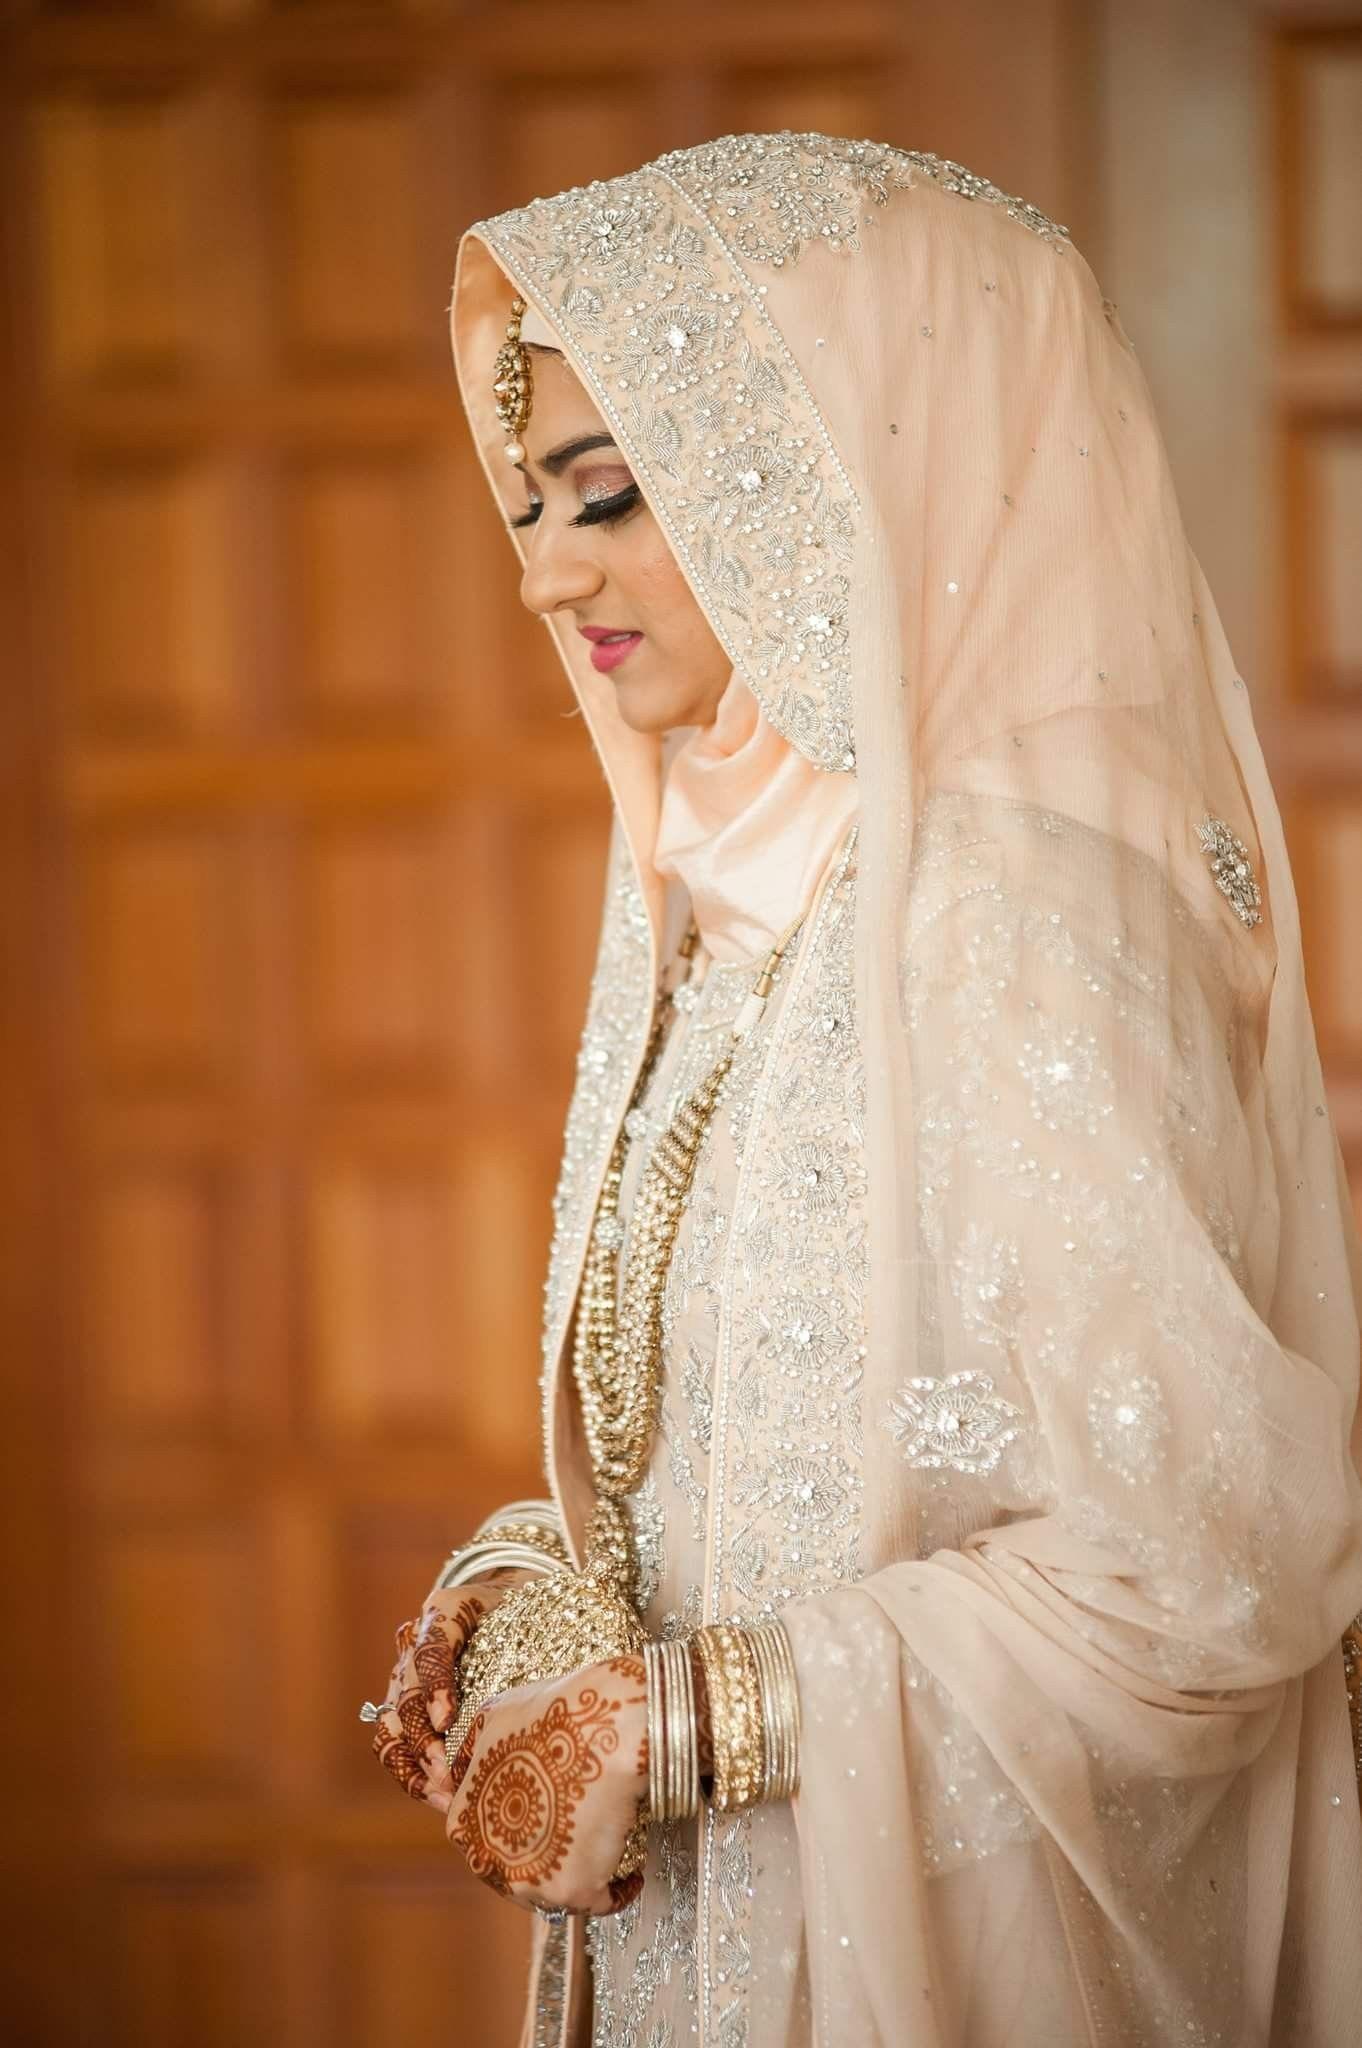 Hijab Engagement Dresses – 27 Beautiful Engagement Dresses for Hijabis foto